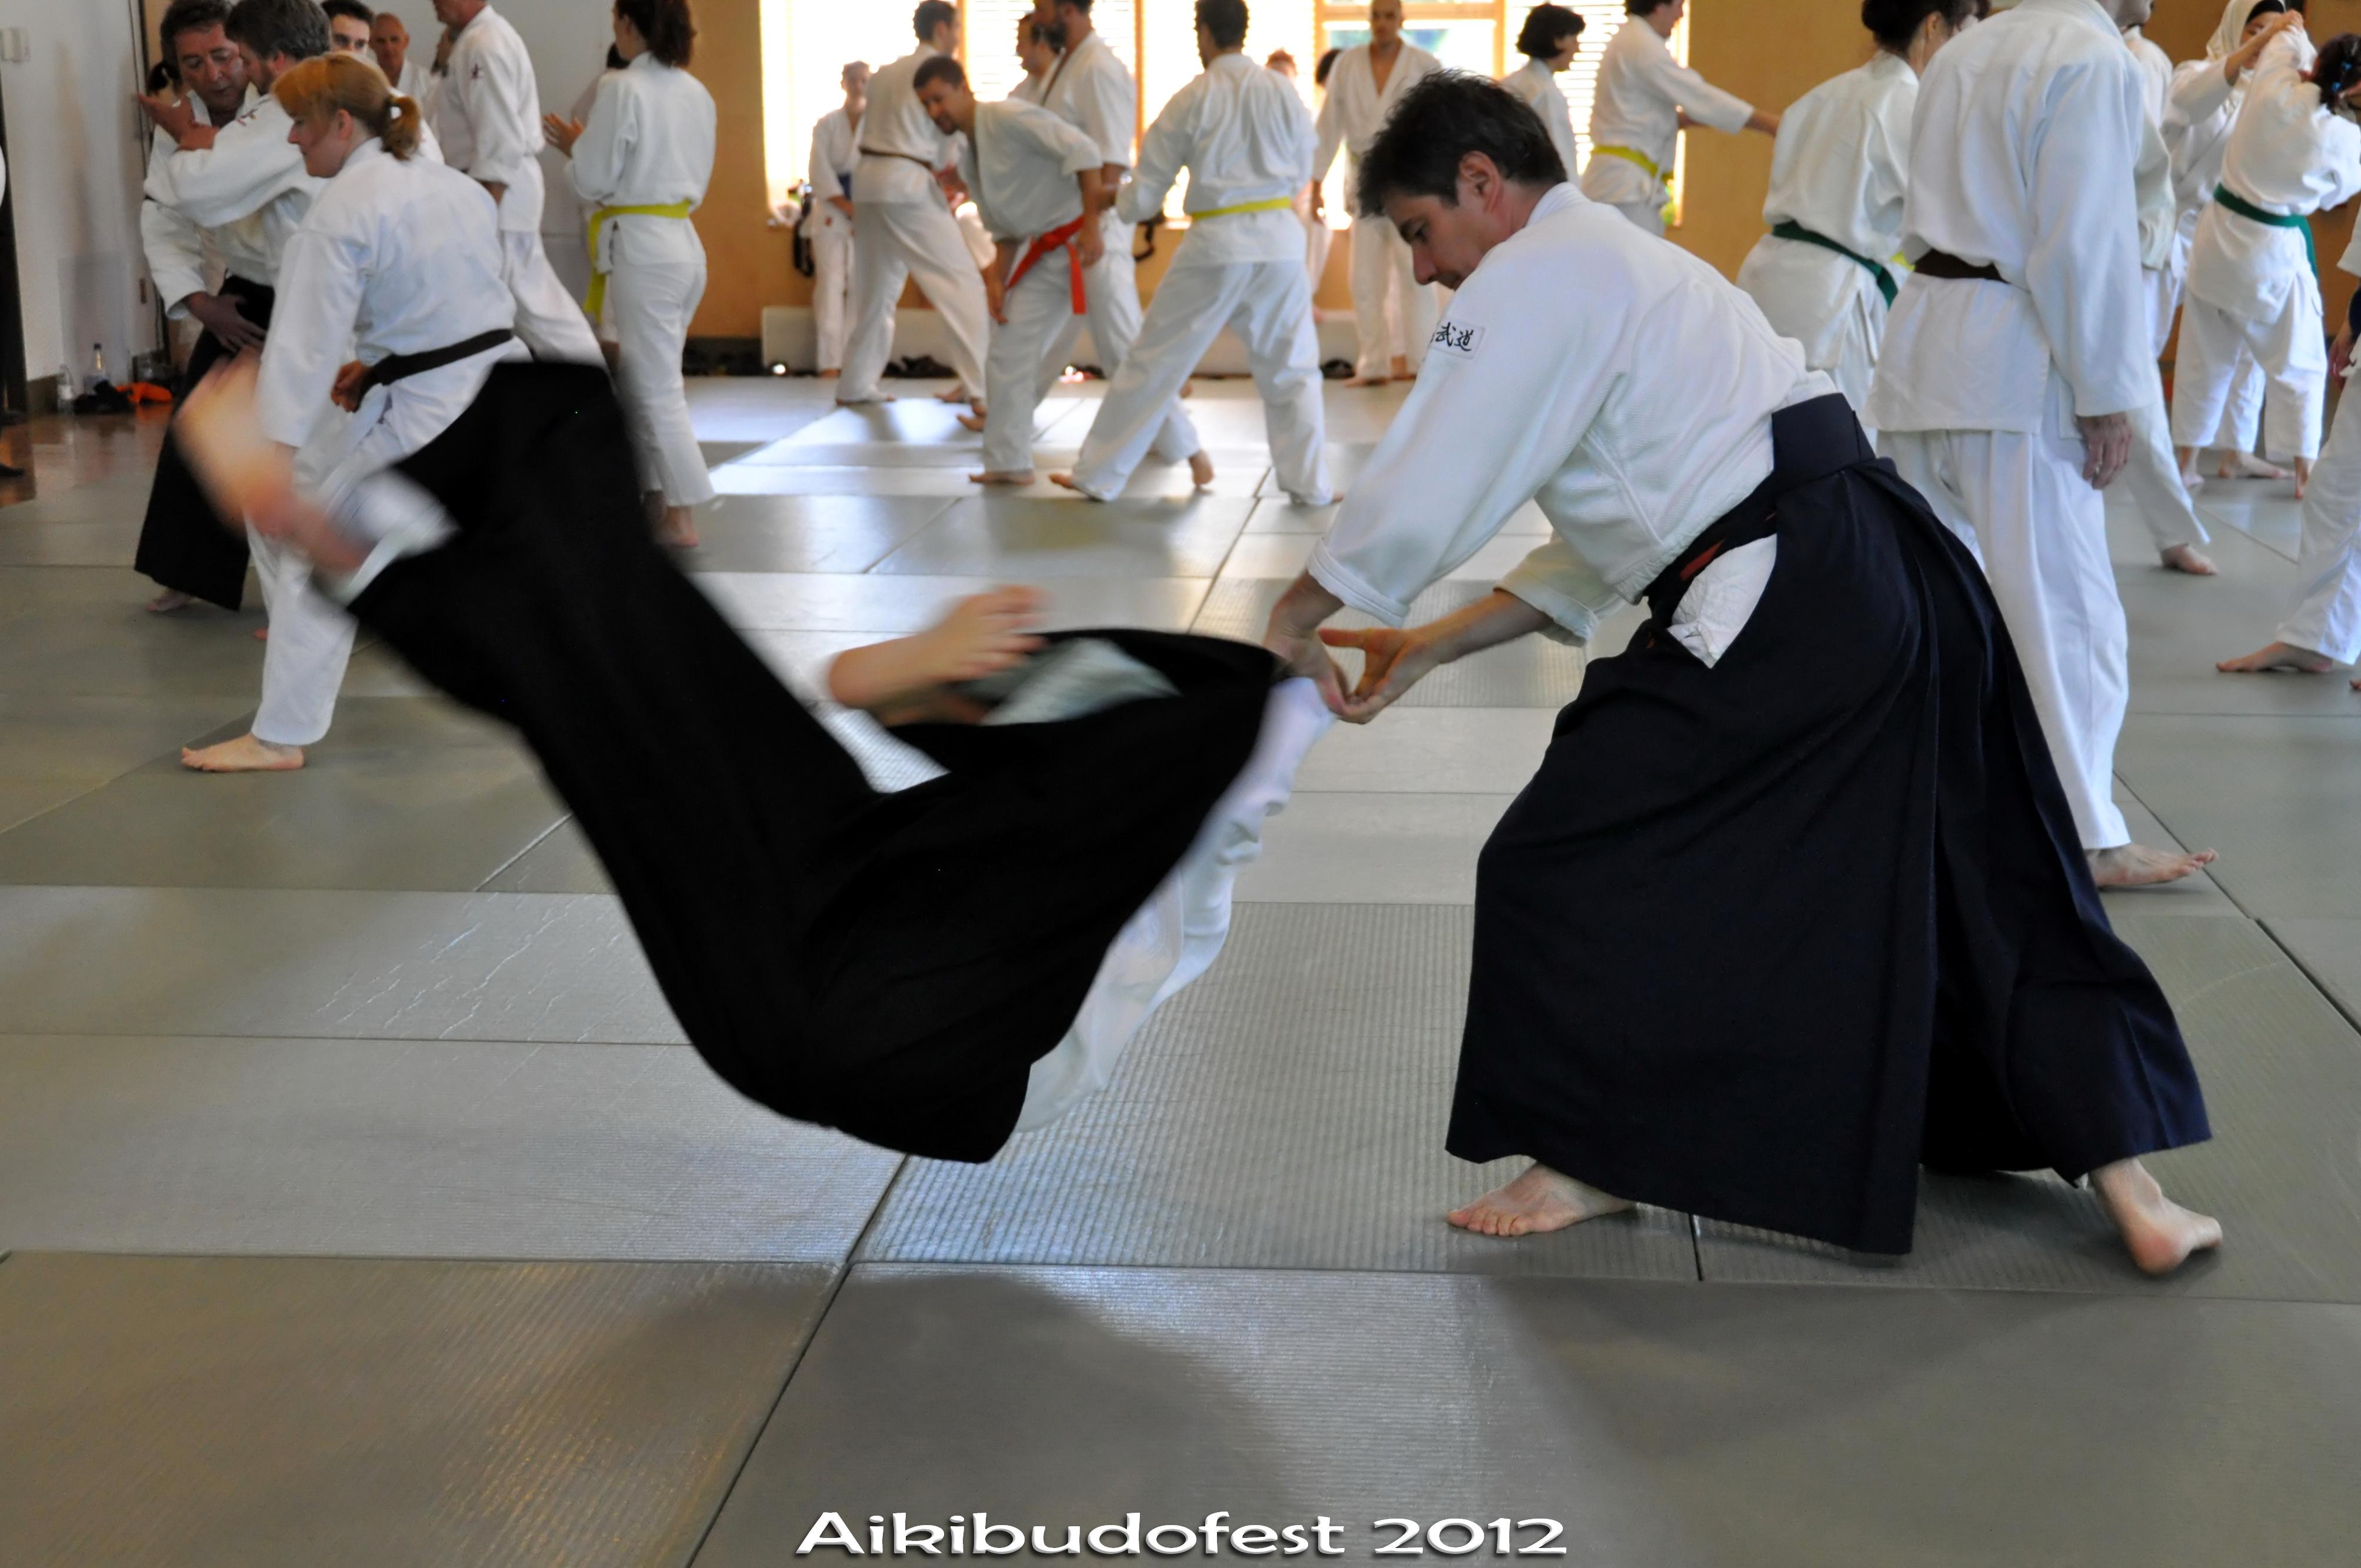 Aikibudofest_2012_samedi_1640